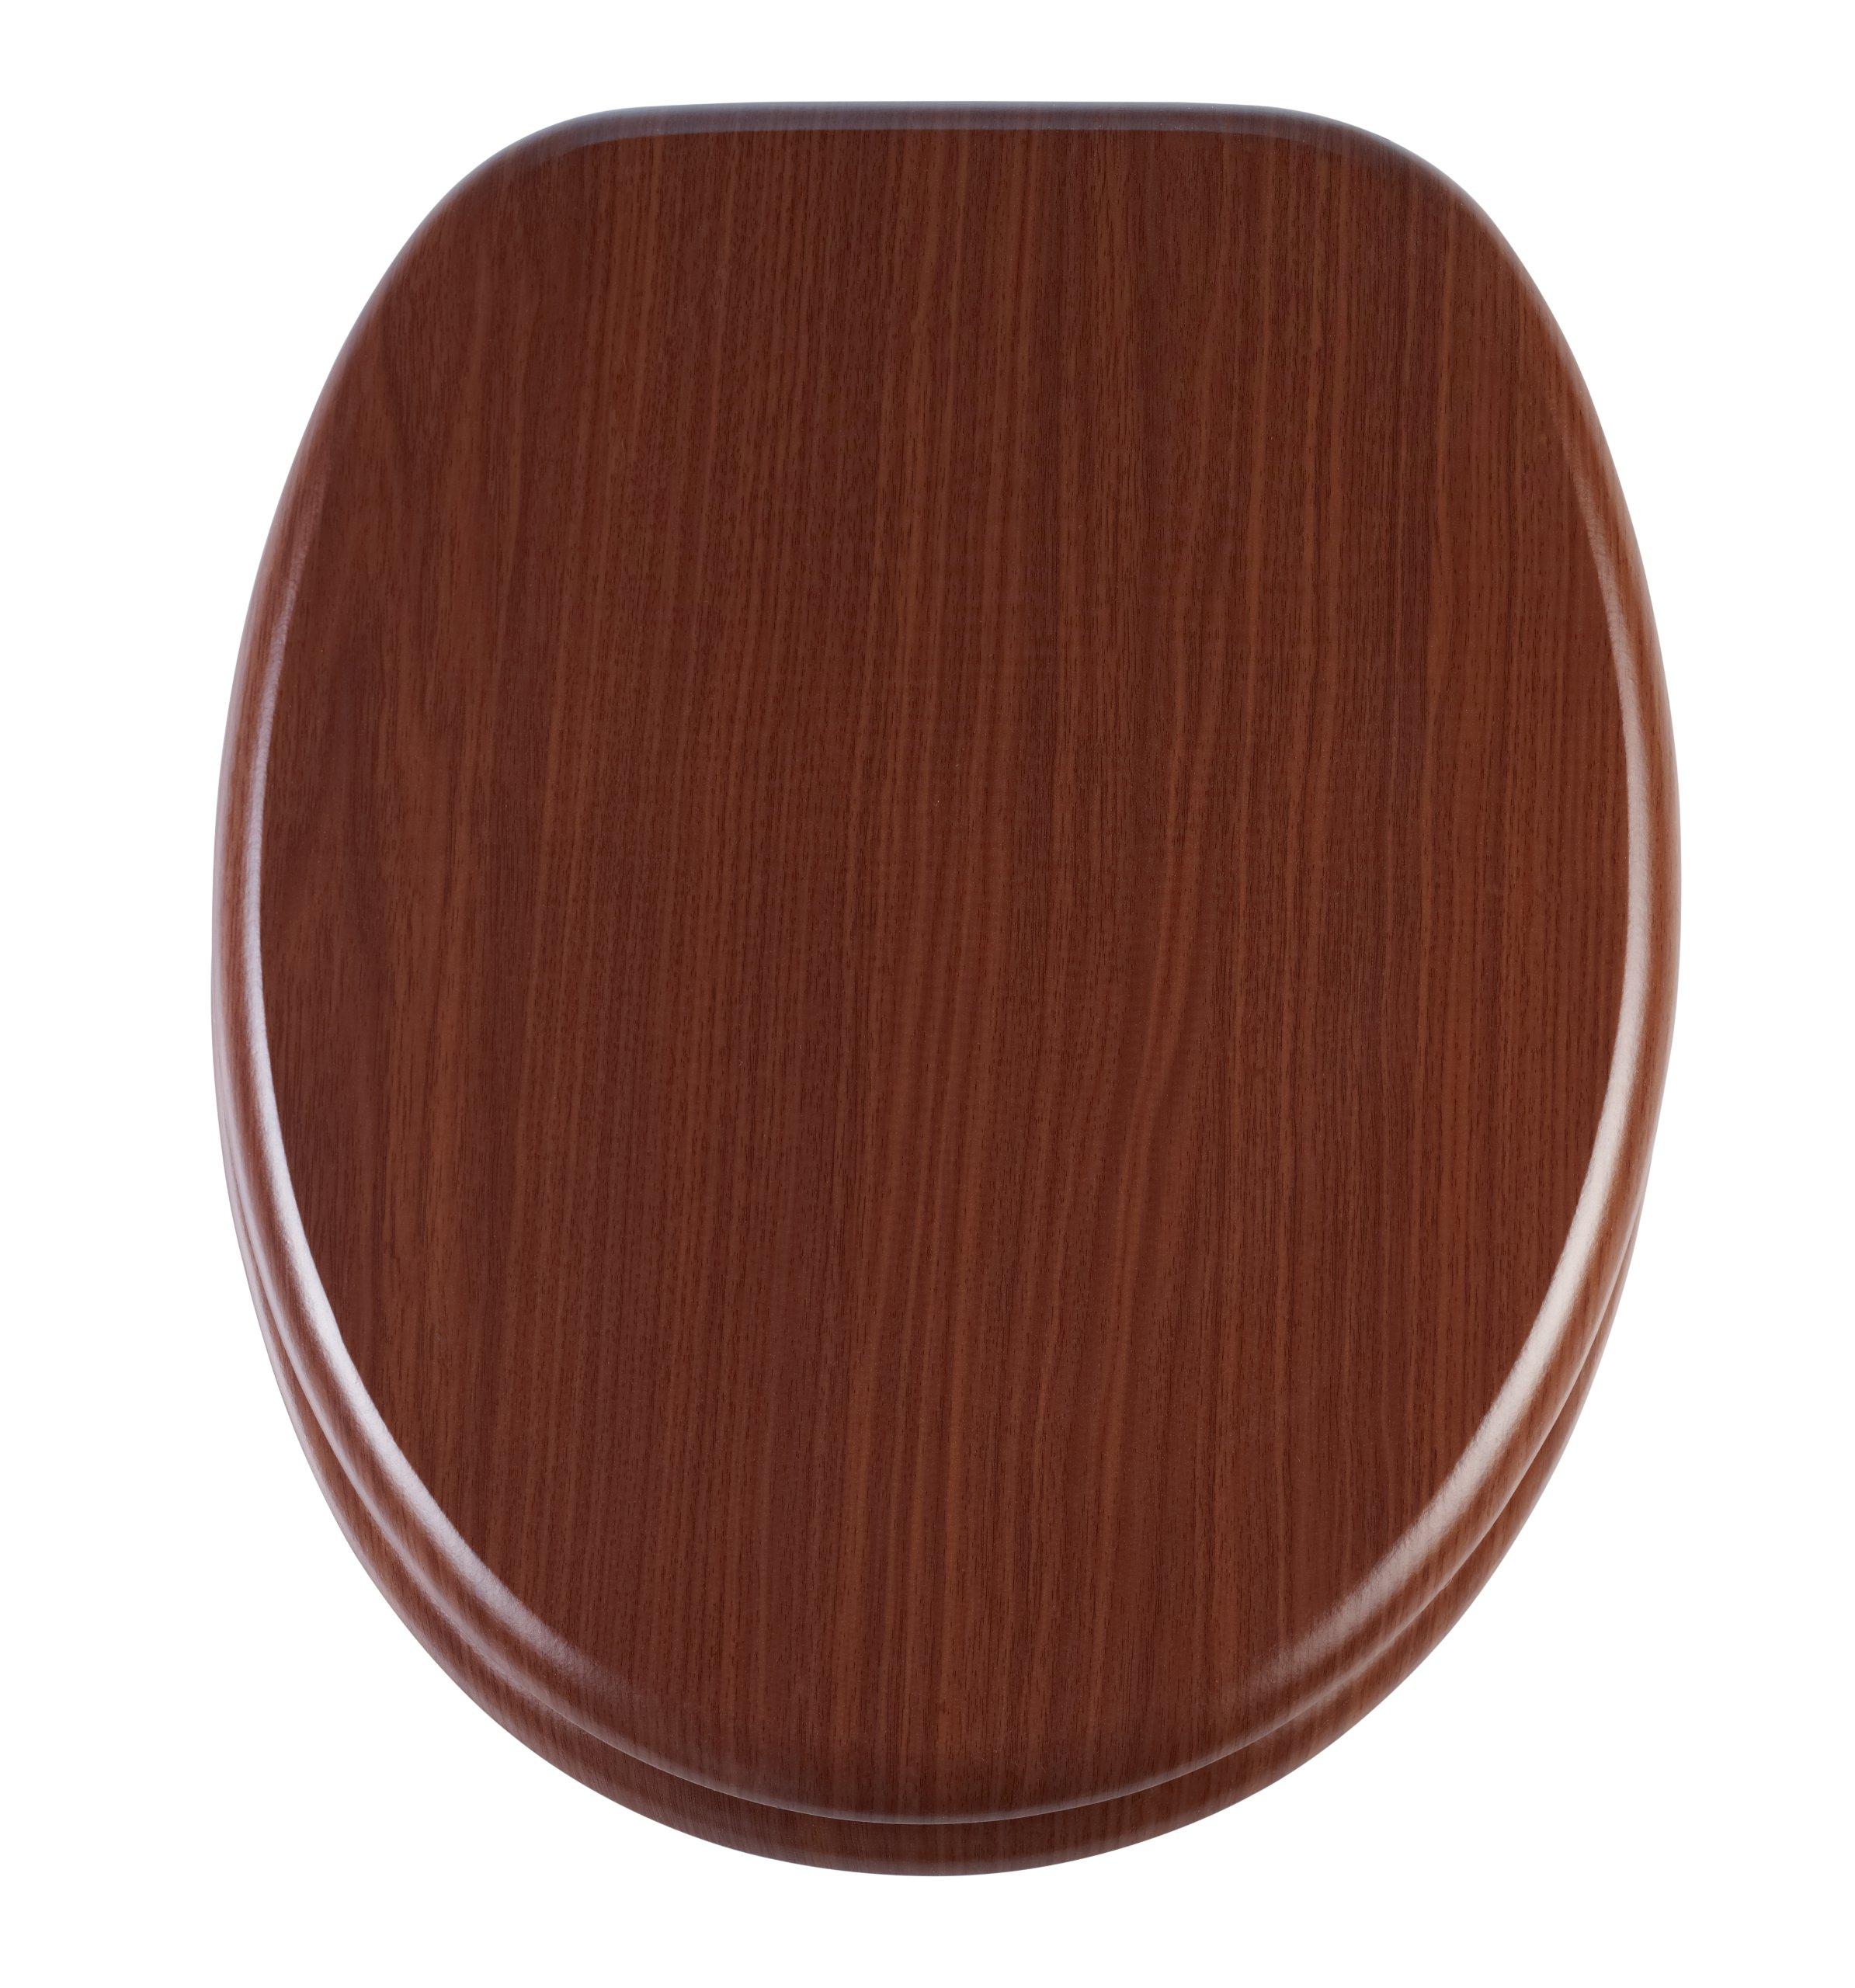 Diaqua Forest 32136197 Toilet Seat Walnut Brown 100 % FSC MDF 42 - 46.5 x 37.1 cm Slow Motion Closing System by Diaqua